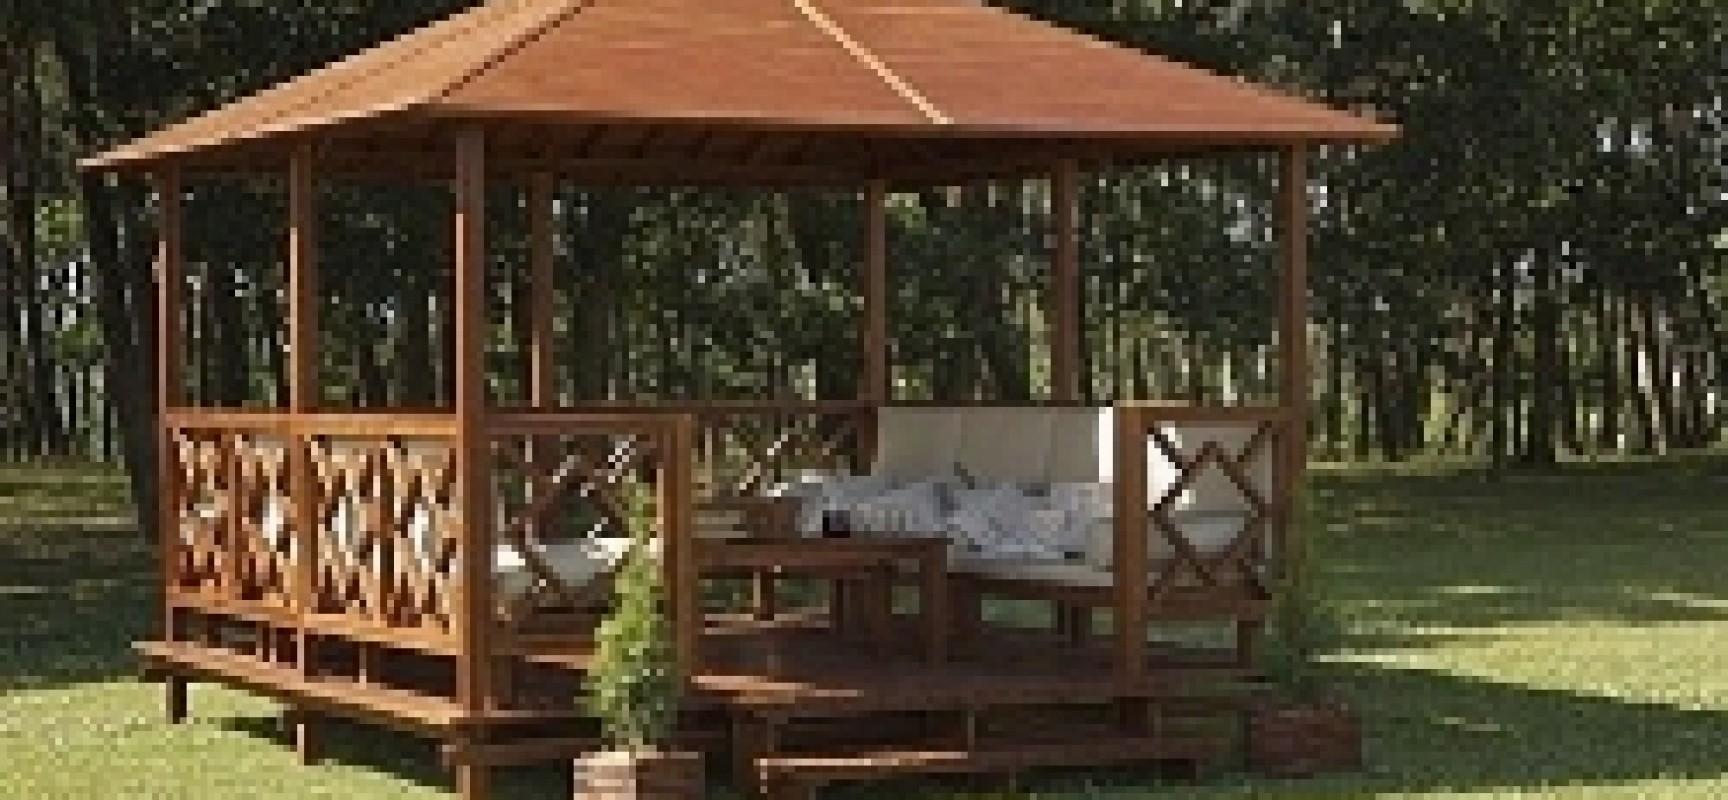 Casa moderna roma italy gazebi pieghevoli leroy merlin for Leroy merlin gazebo giardino in legno